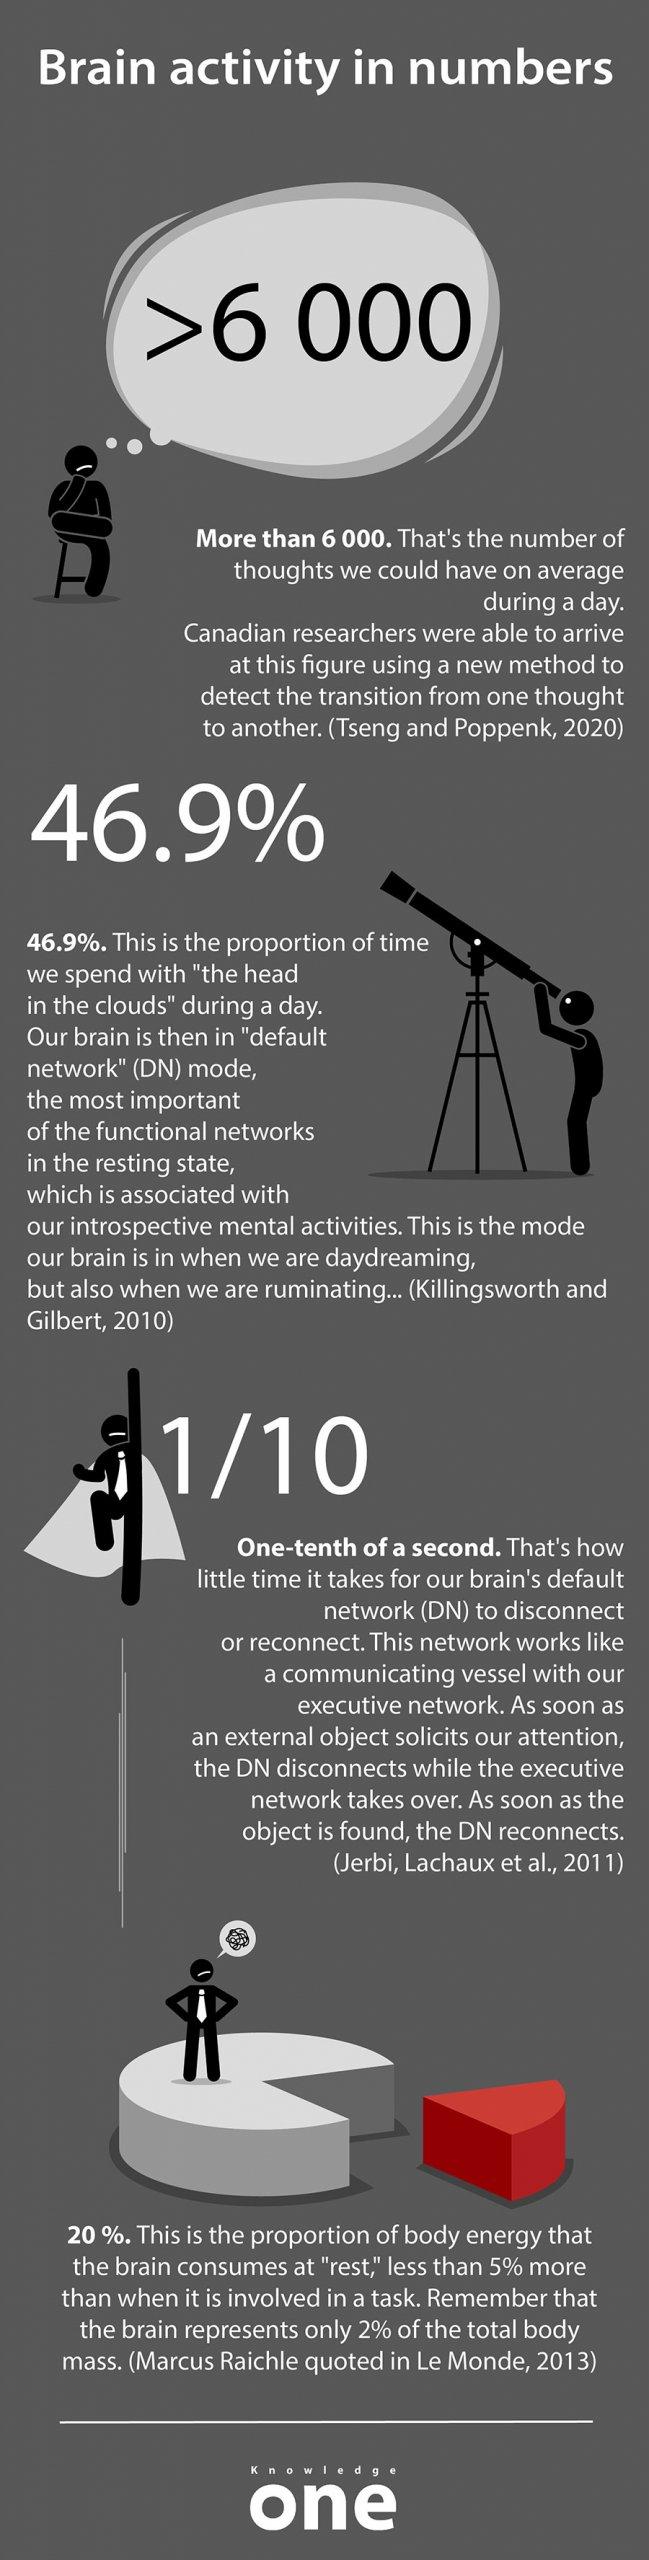 Infographic on brain activity